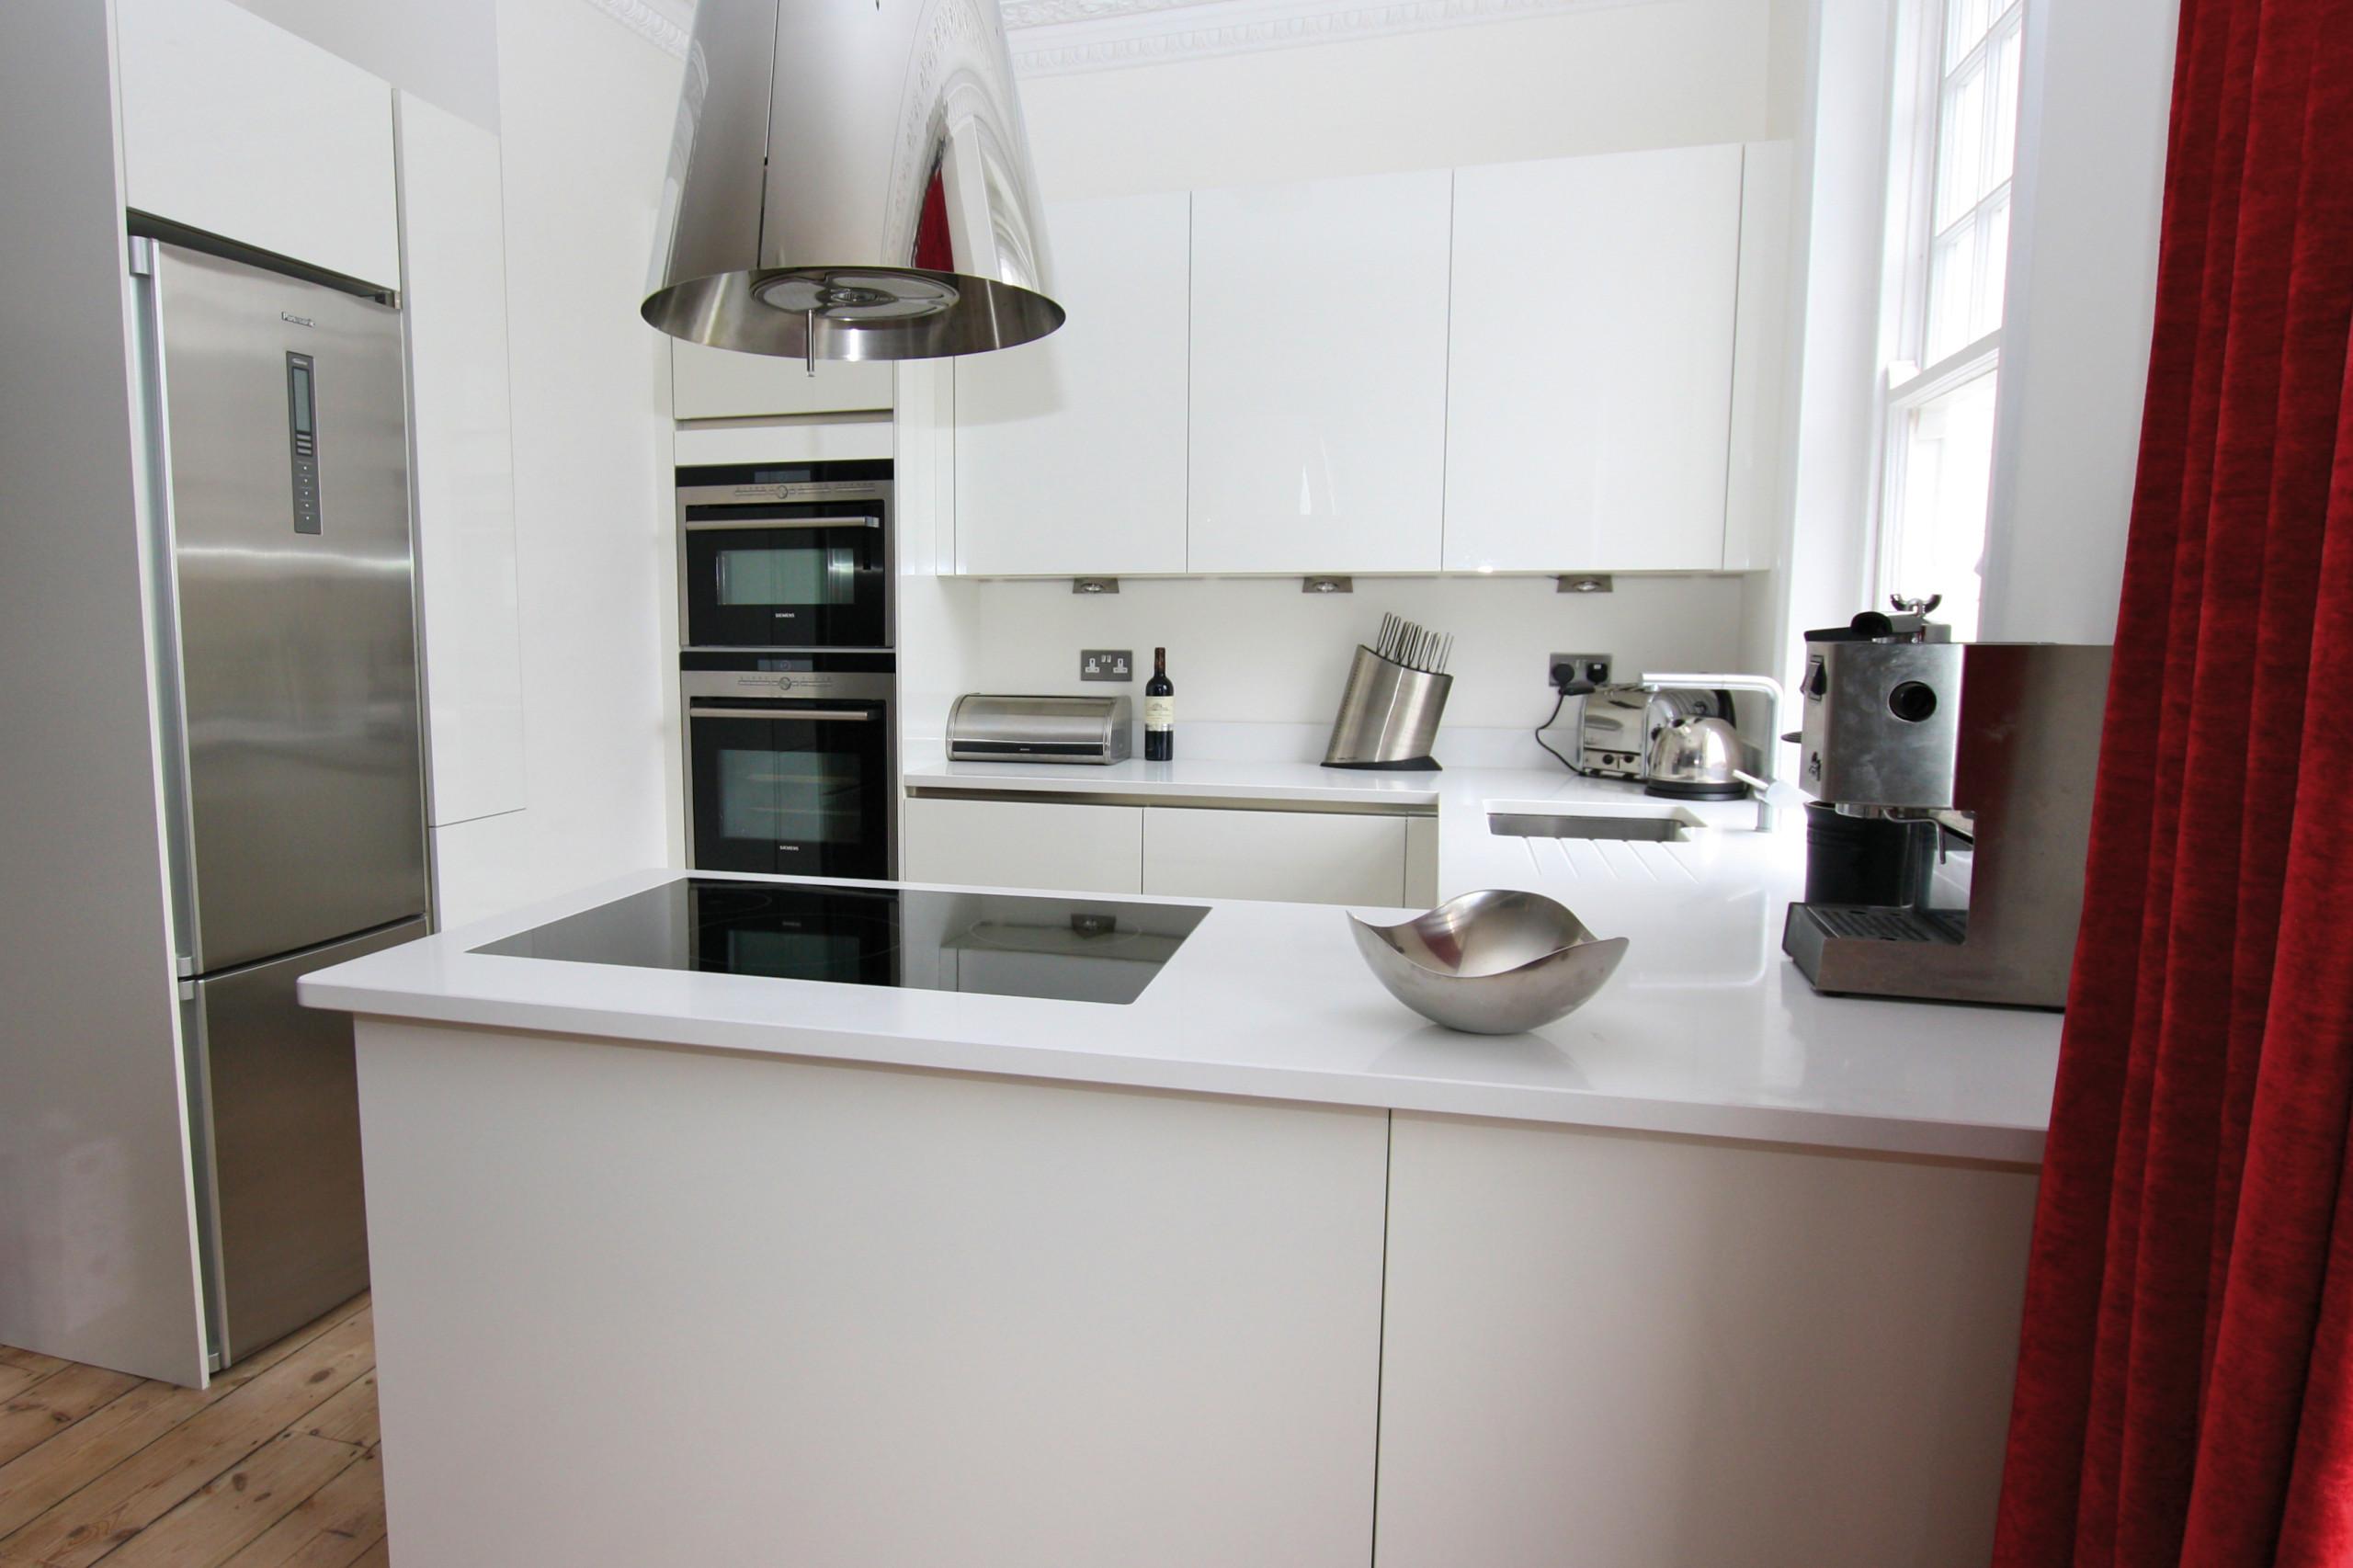 G Shaped Kitchen Houzz